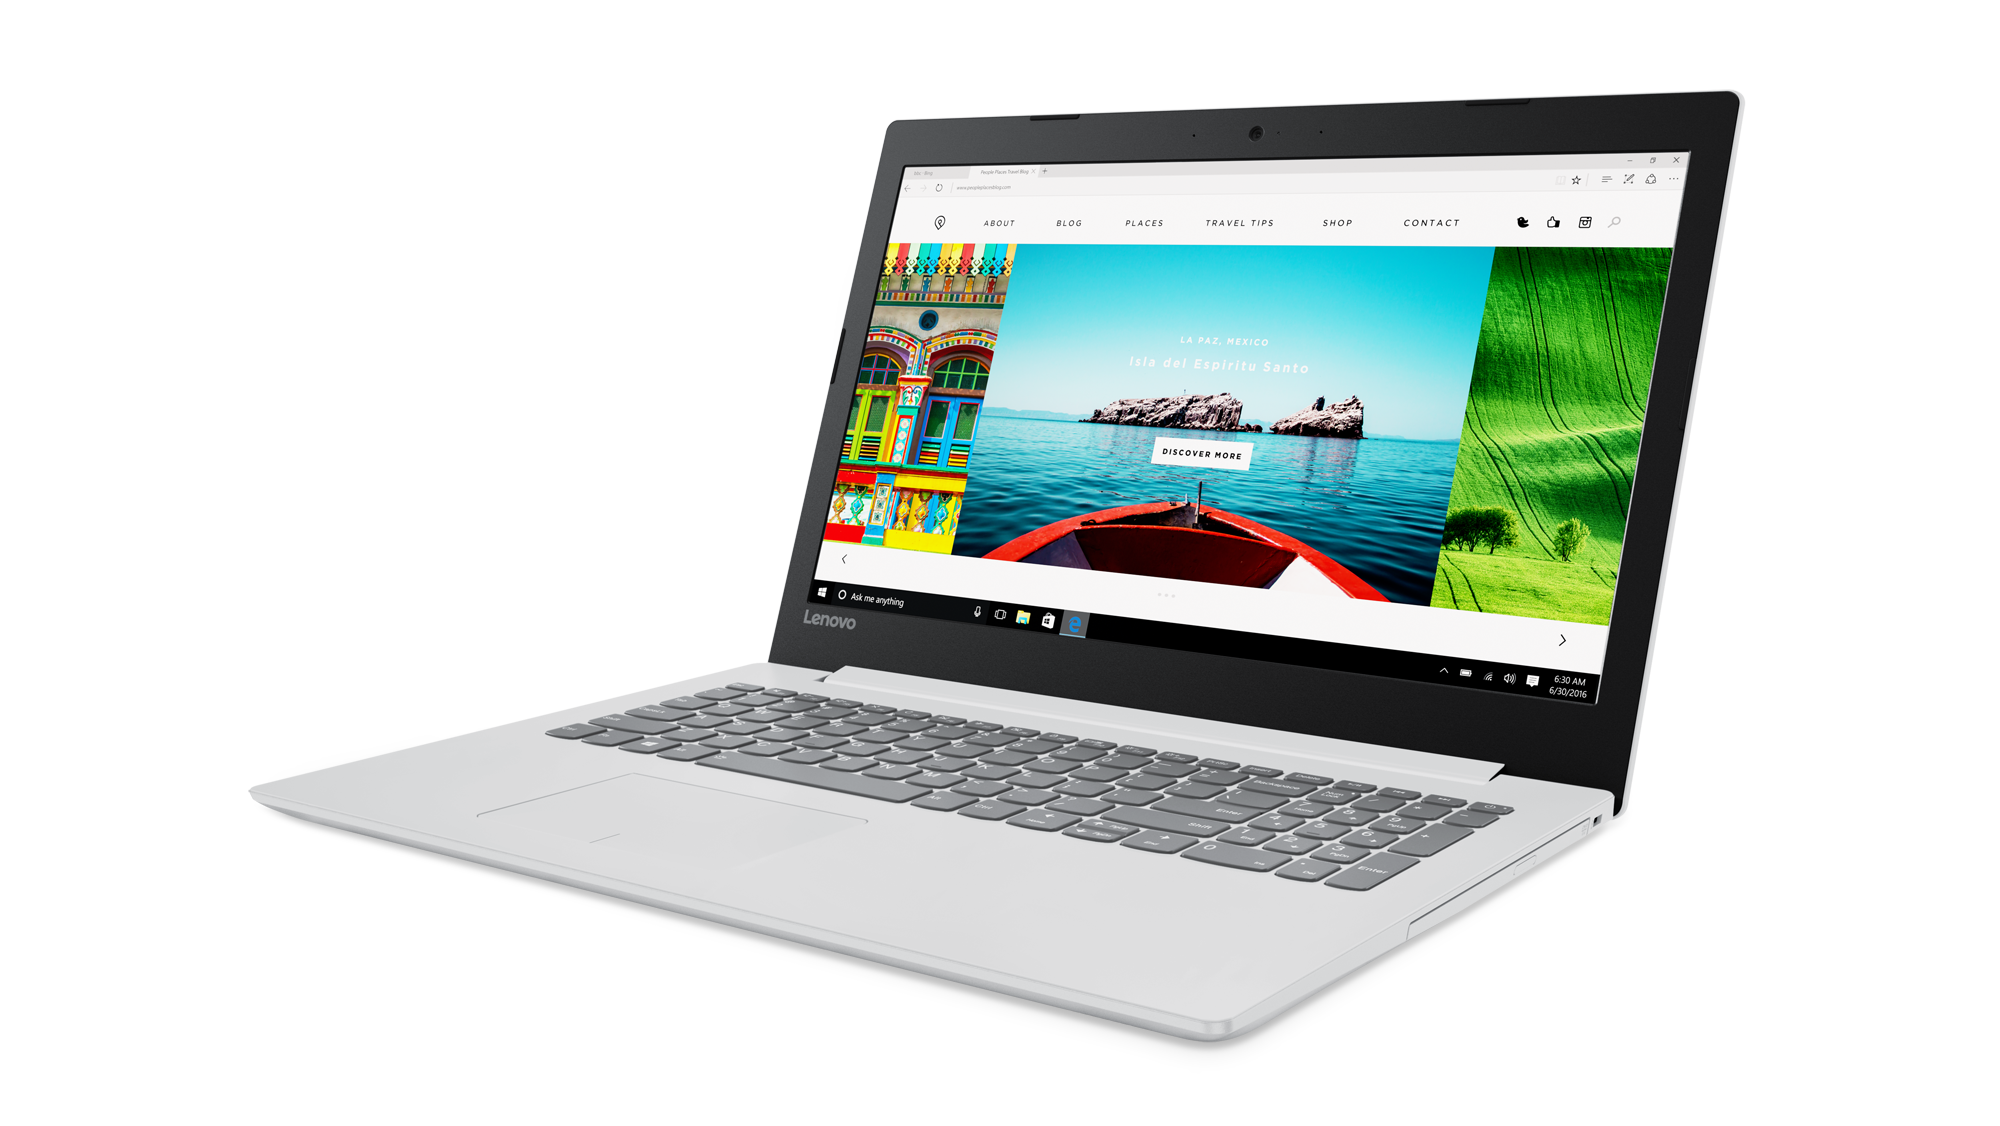 "Lenovo IdeaPad 320-15IKBA i5-7200U 3,10GHz/6GB/SSD 128GB/15,6"" FHD/AG/Radeon 2GB/WIN10 bílá 80YE000PCK"